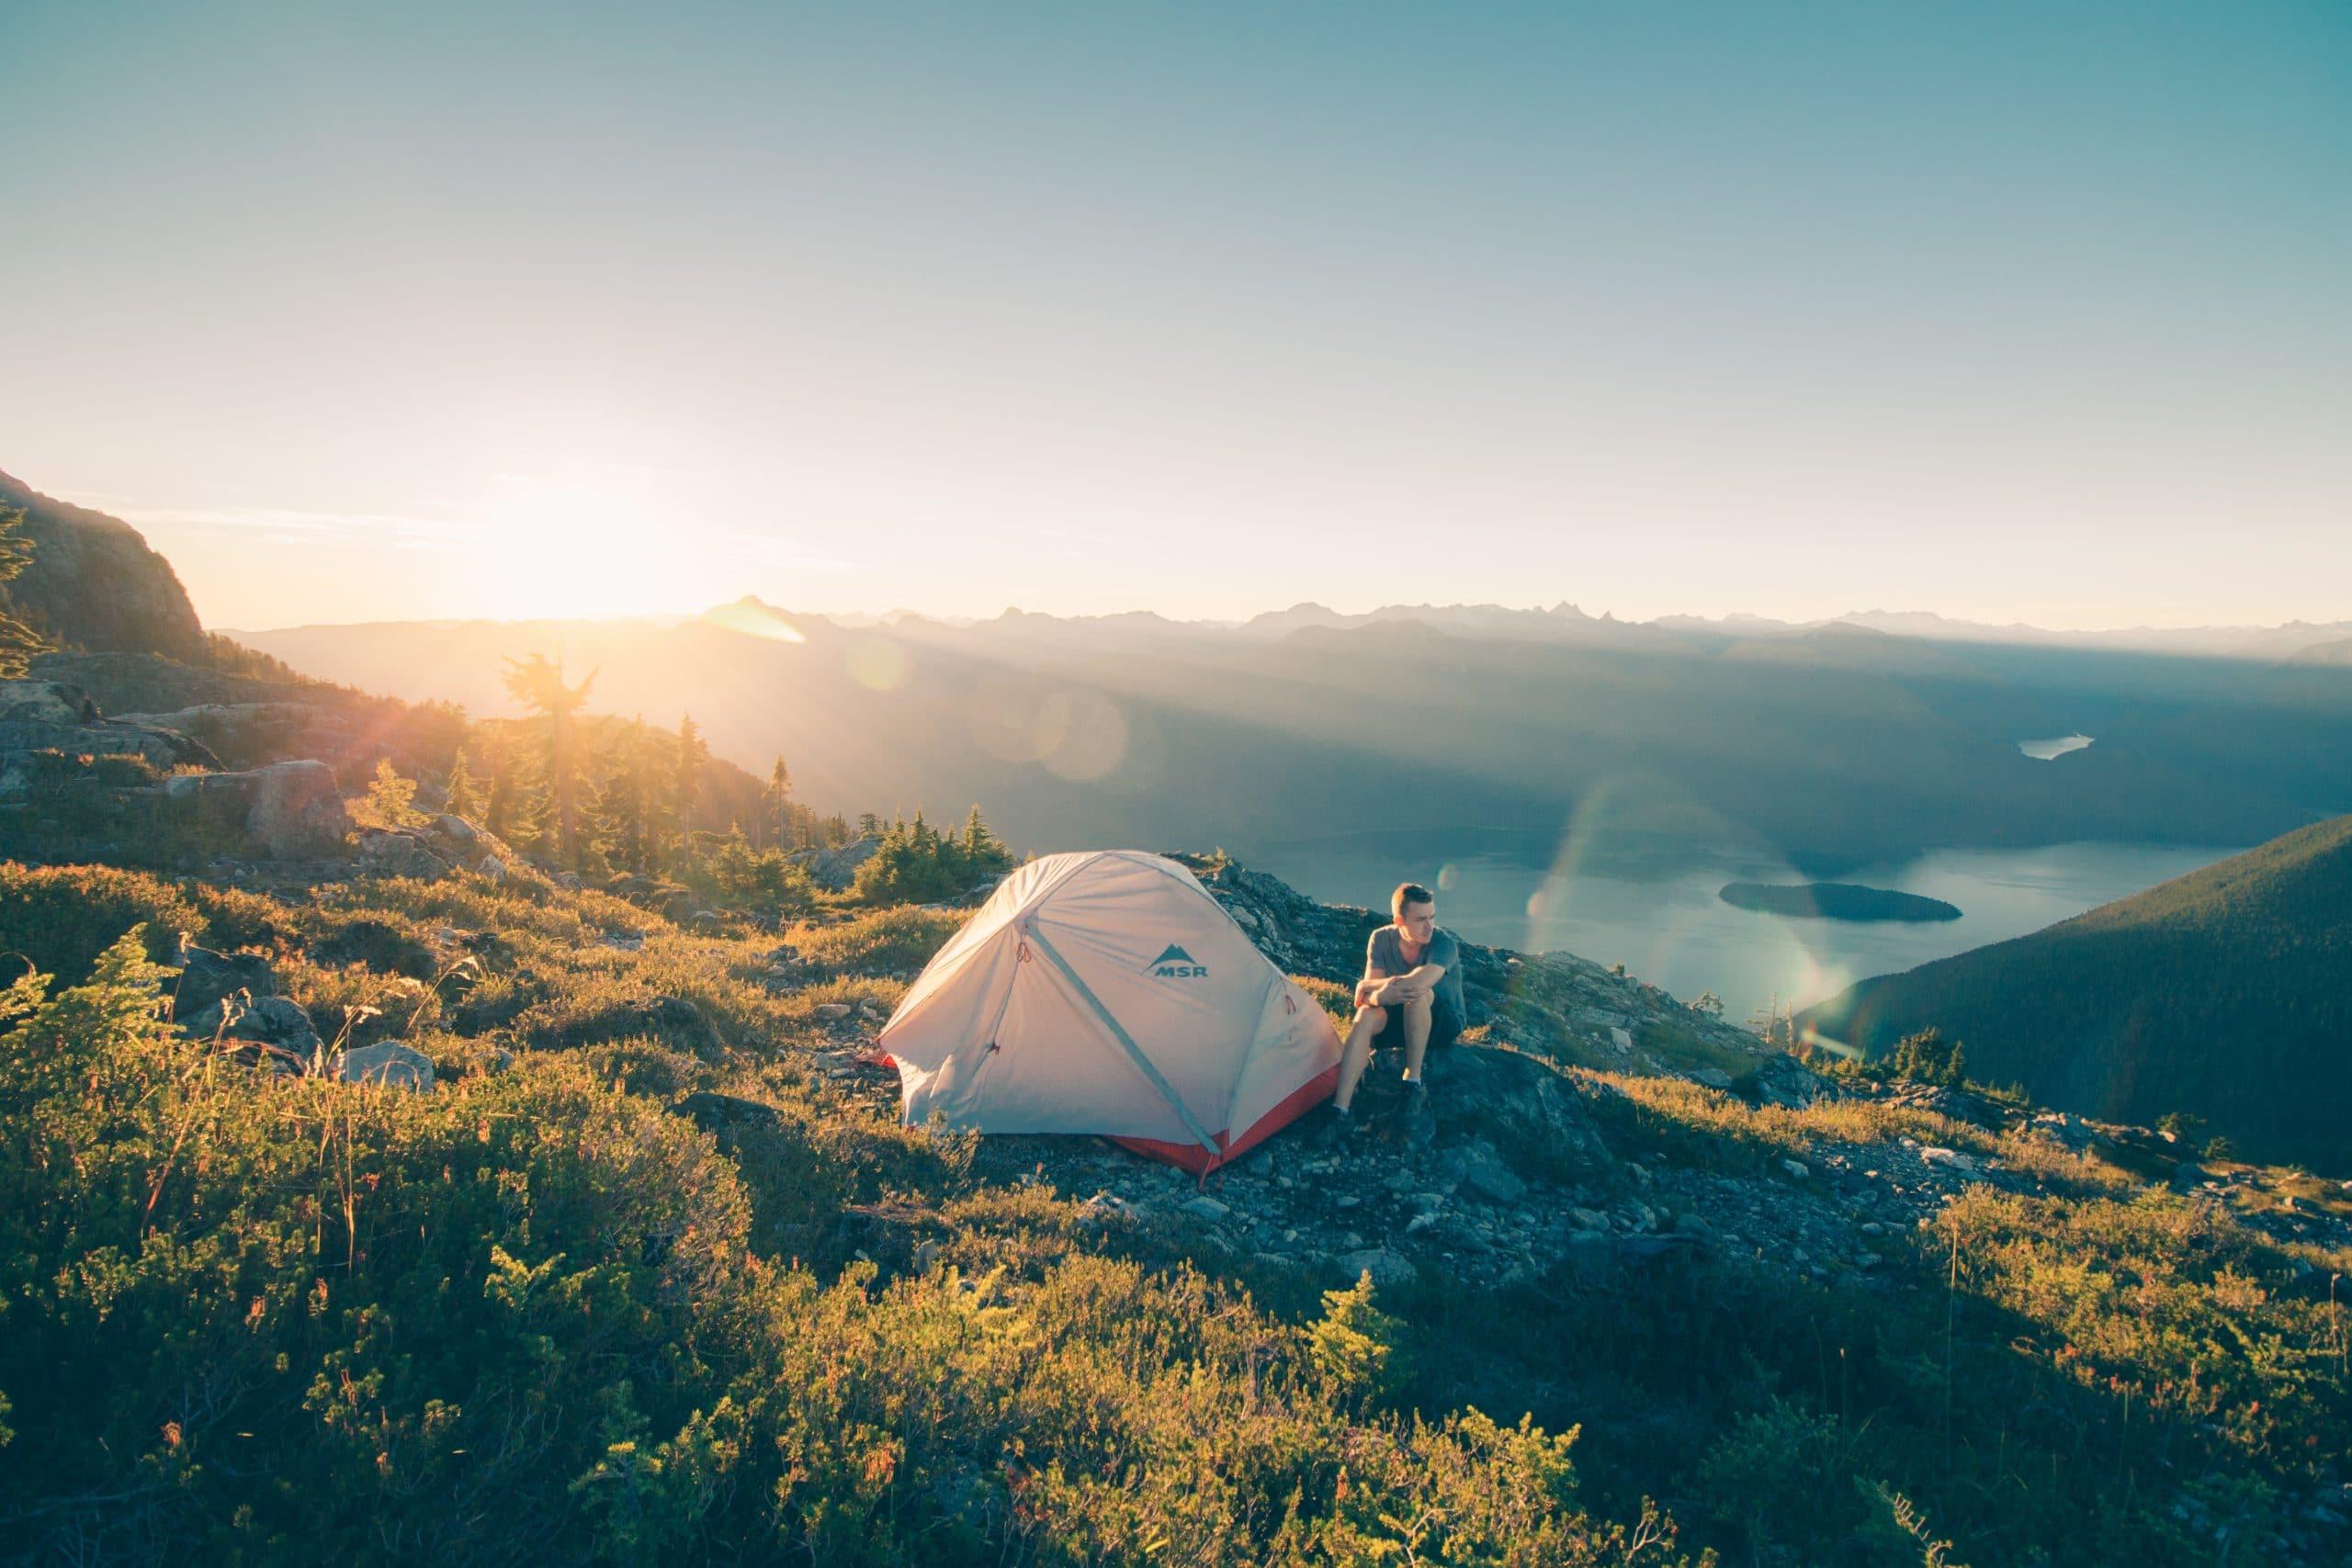 Essential Gear Checklist Camping